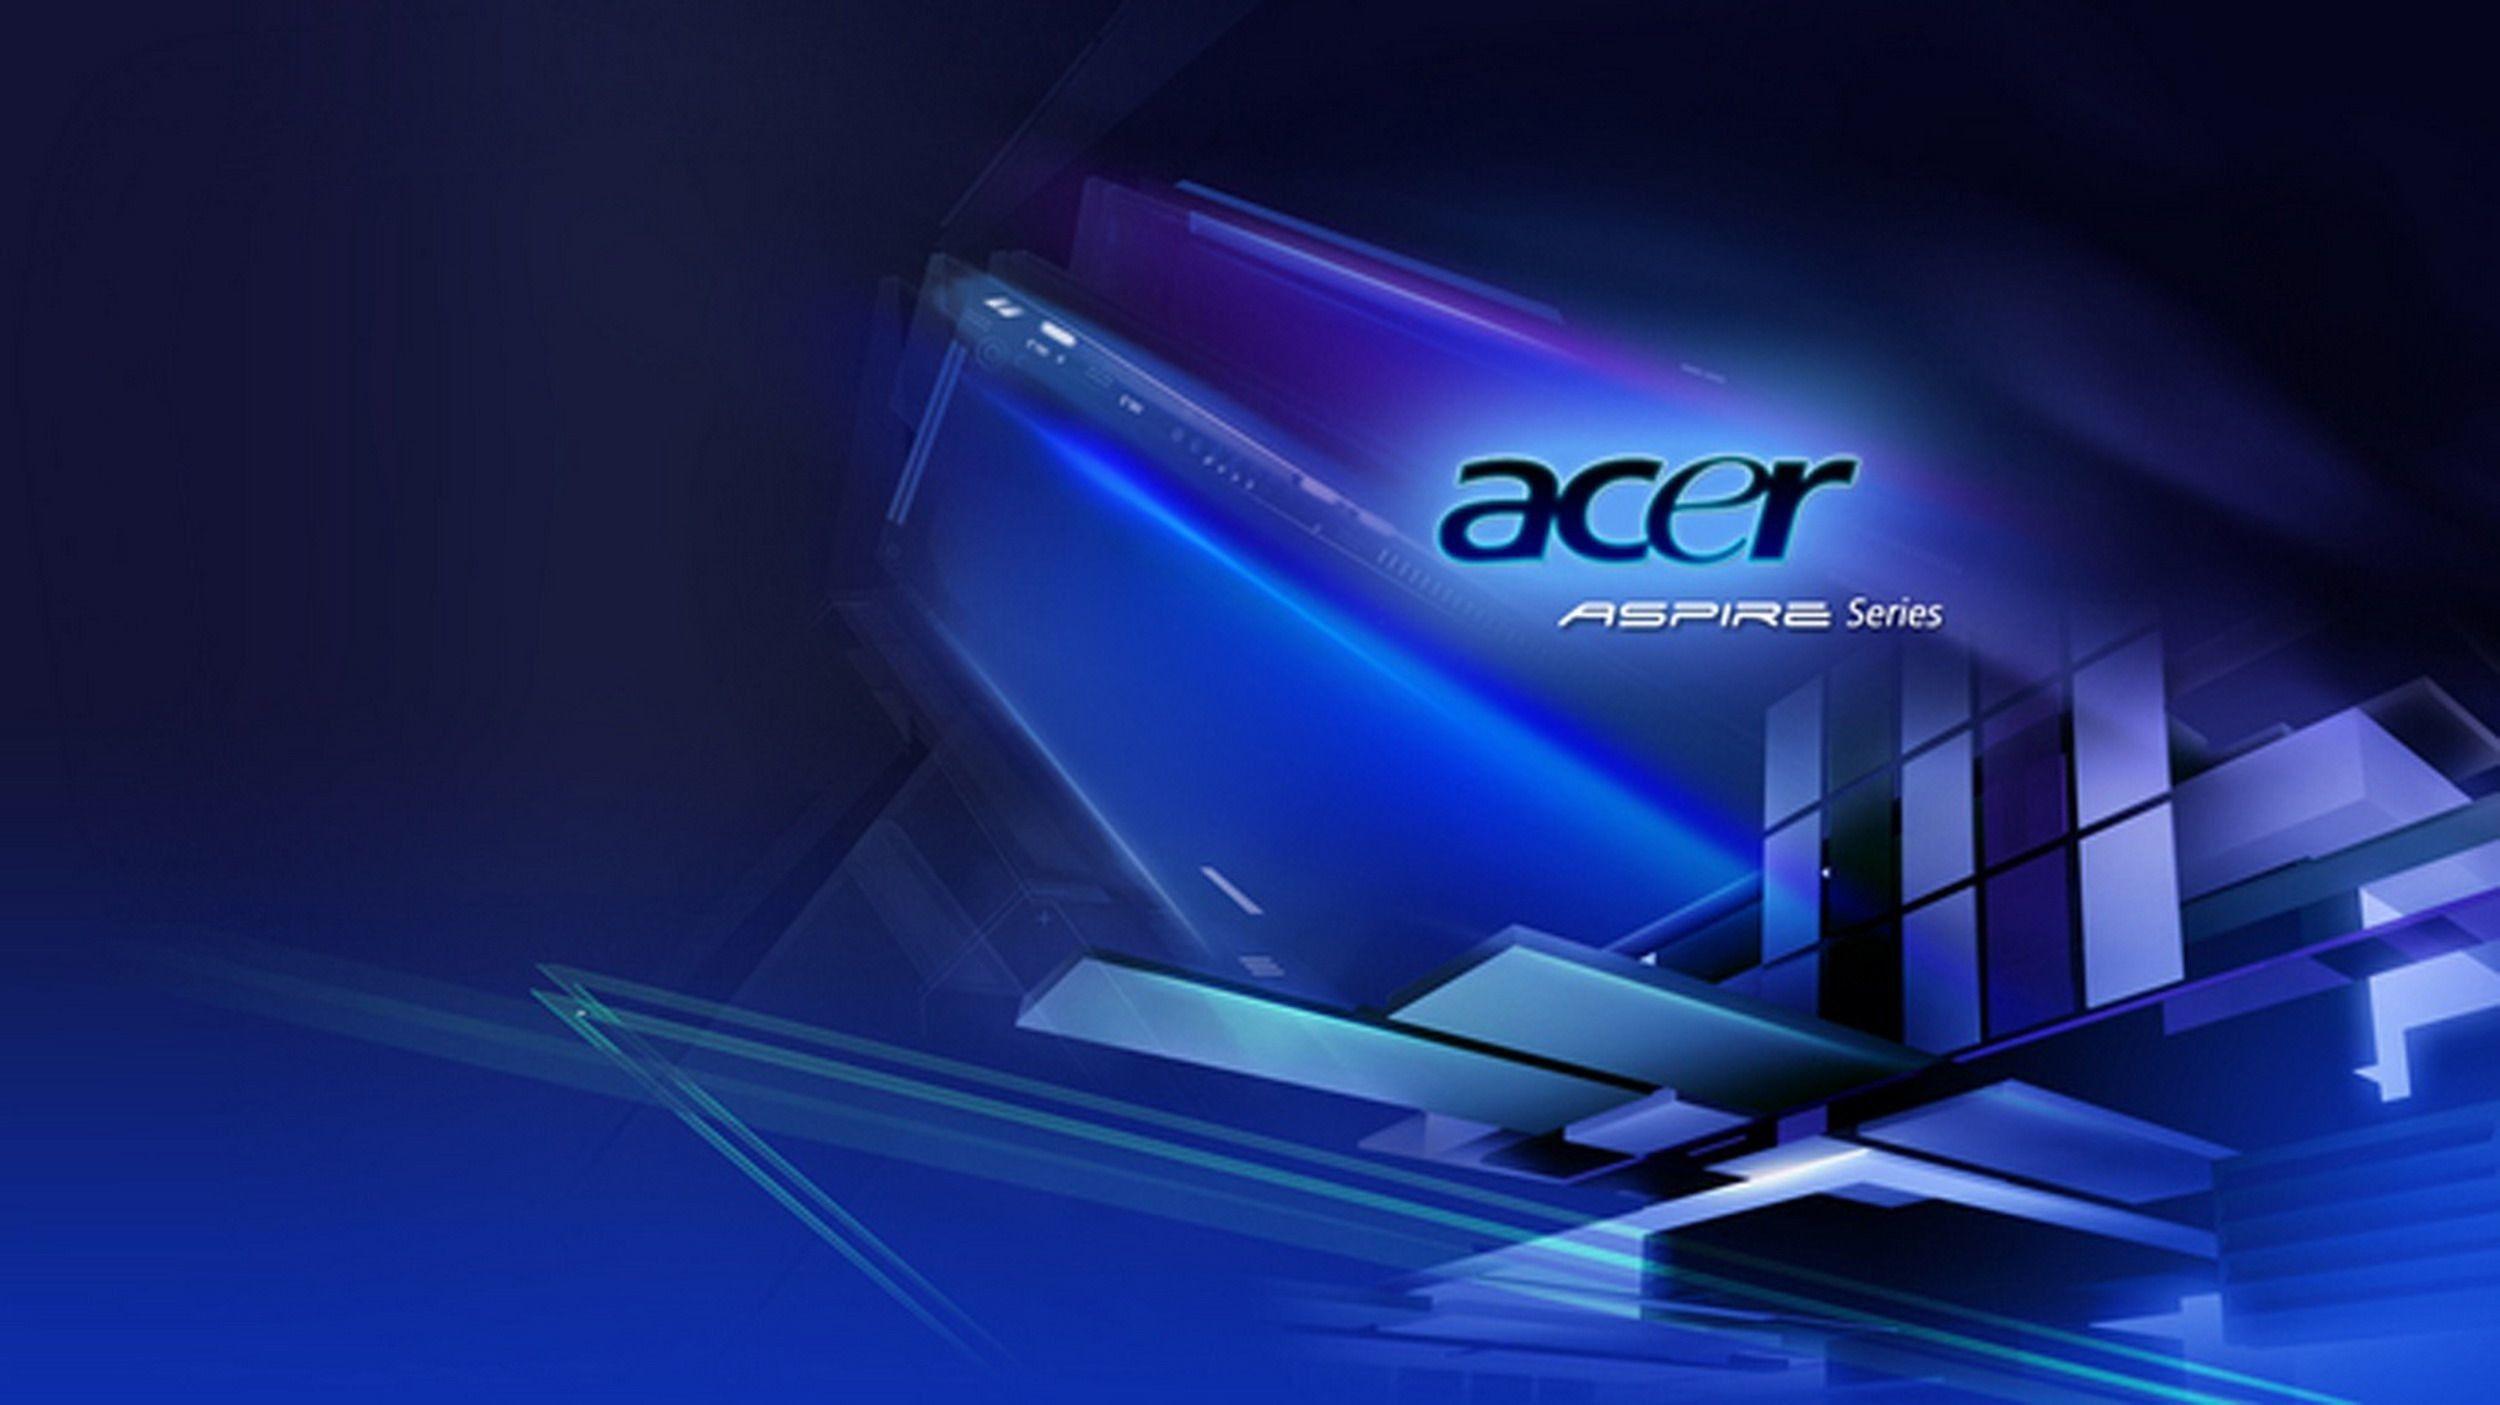 2500x1405 Acer Desktop Backgrounds Wallpapers Hd Wallpapers Pinterest Acer Desktop Hd Wallpaper And Hd Wallpapers For Laptop Acer Desktop Wallpaper Pc